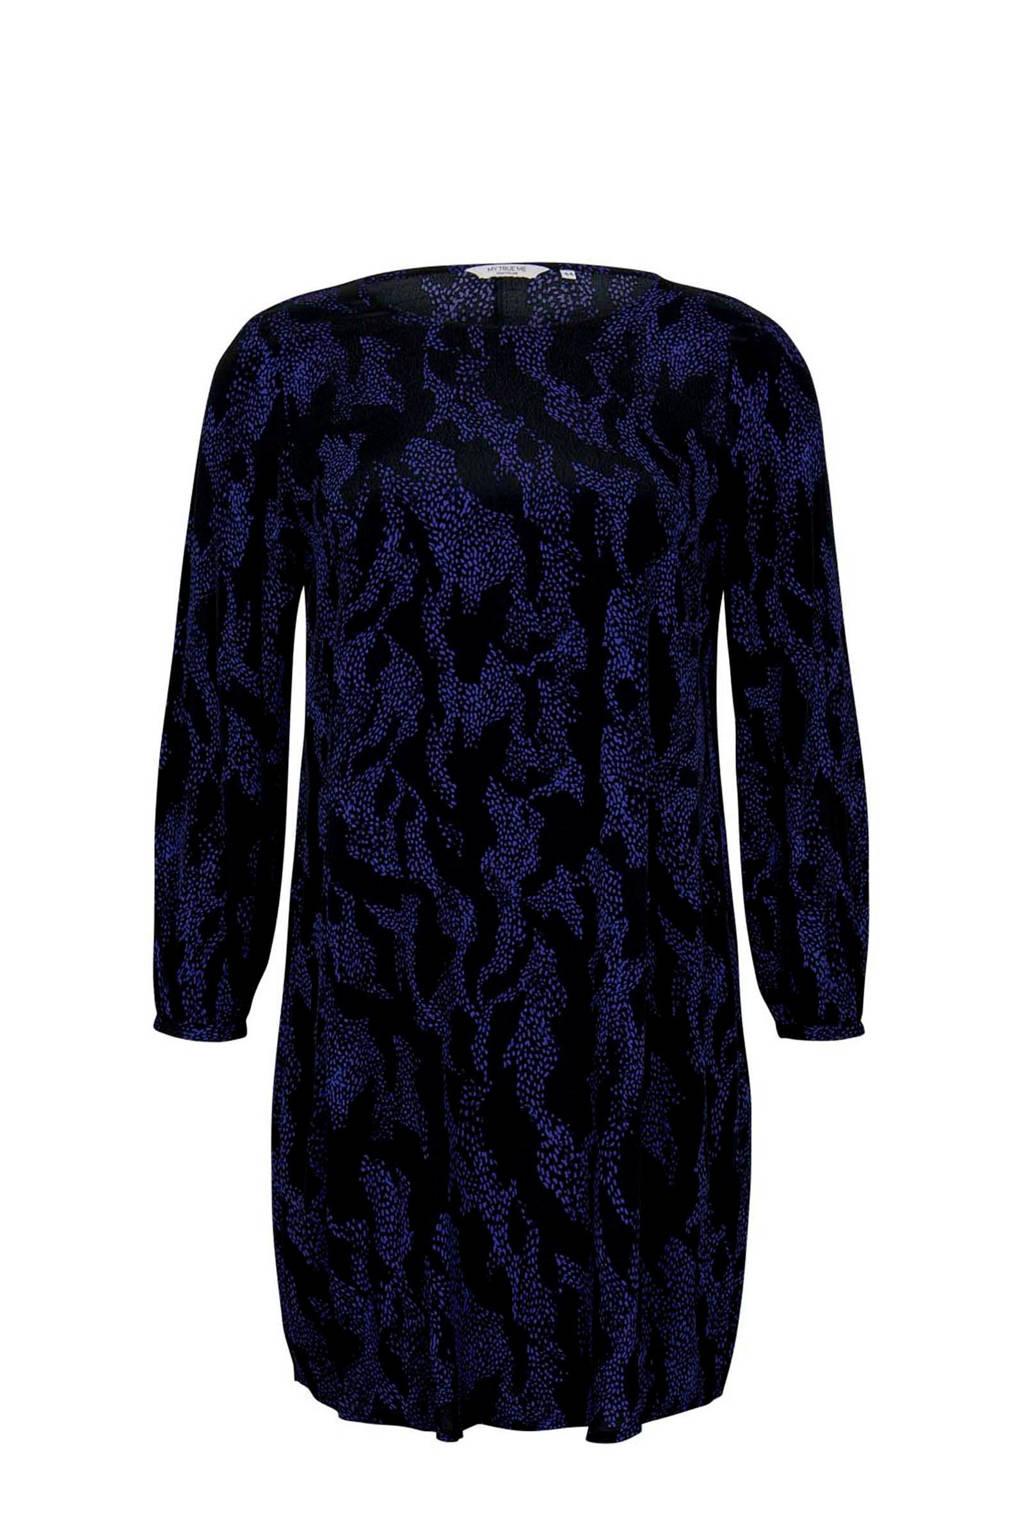 Tom Tailor My True Me jurk met all over print zwart/donkerblauw, Zwart/donkerblauw